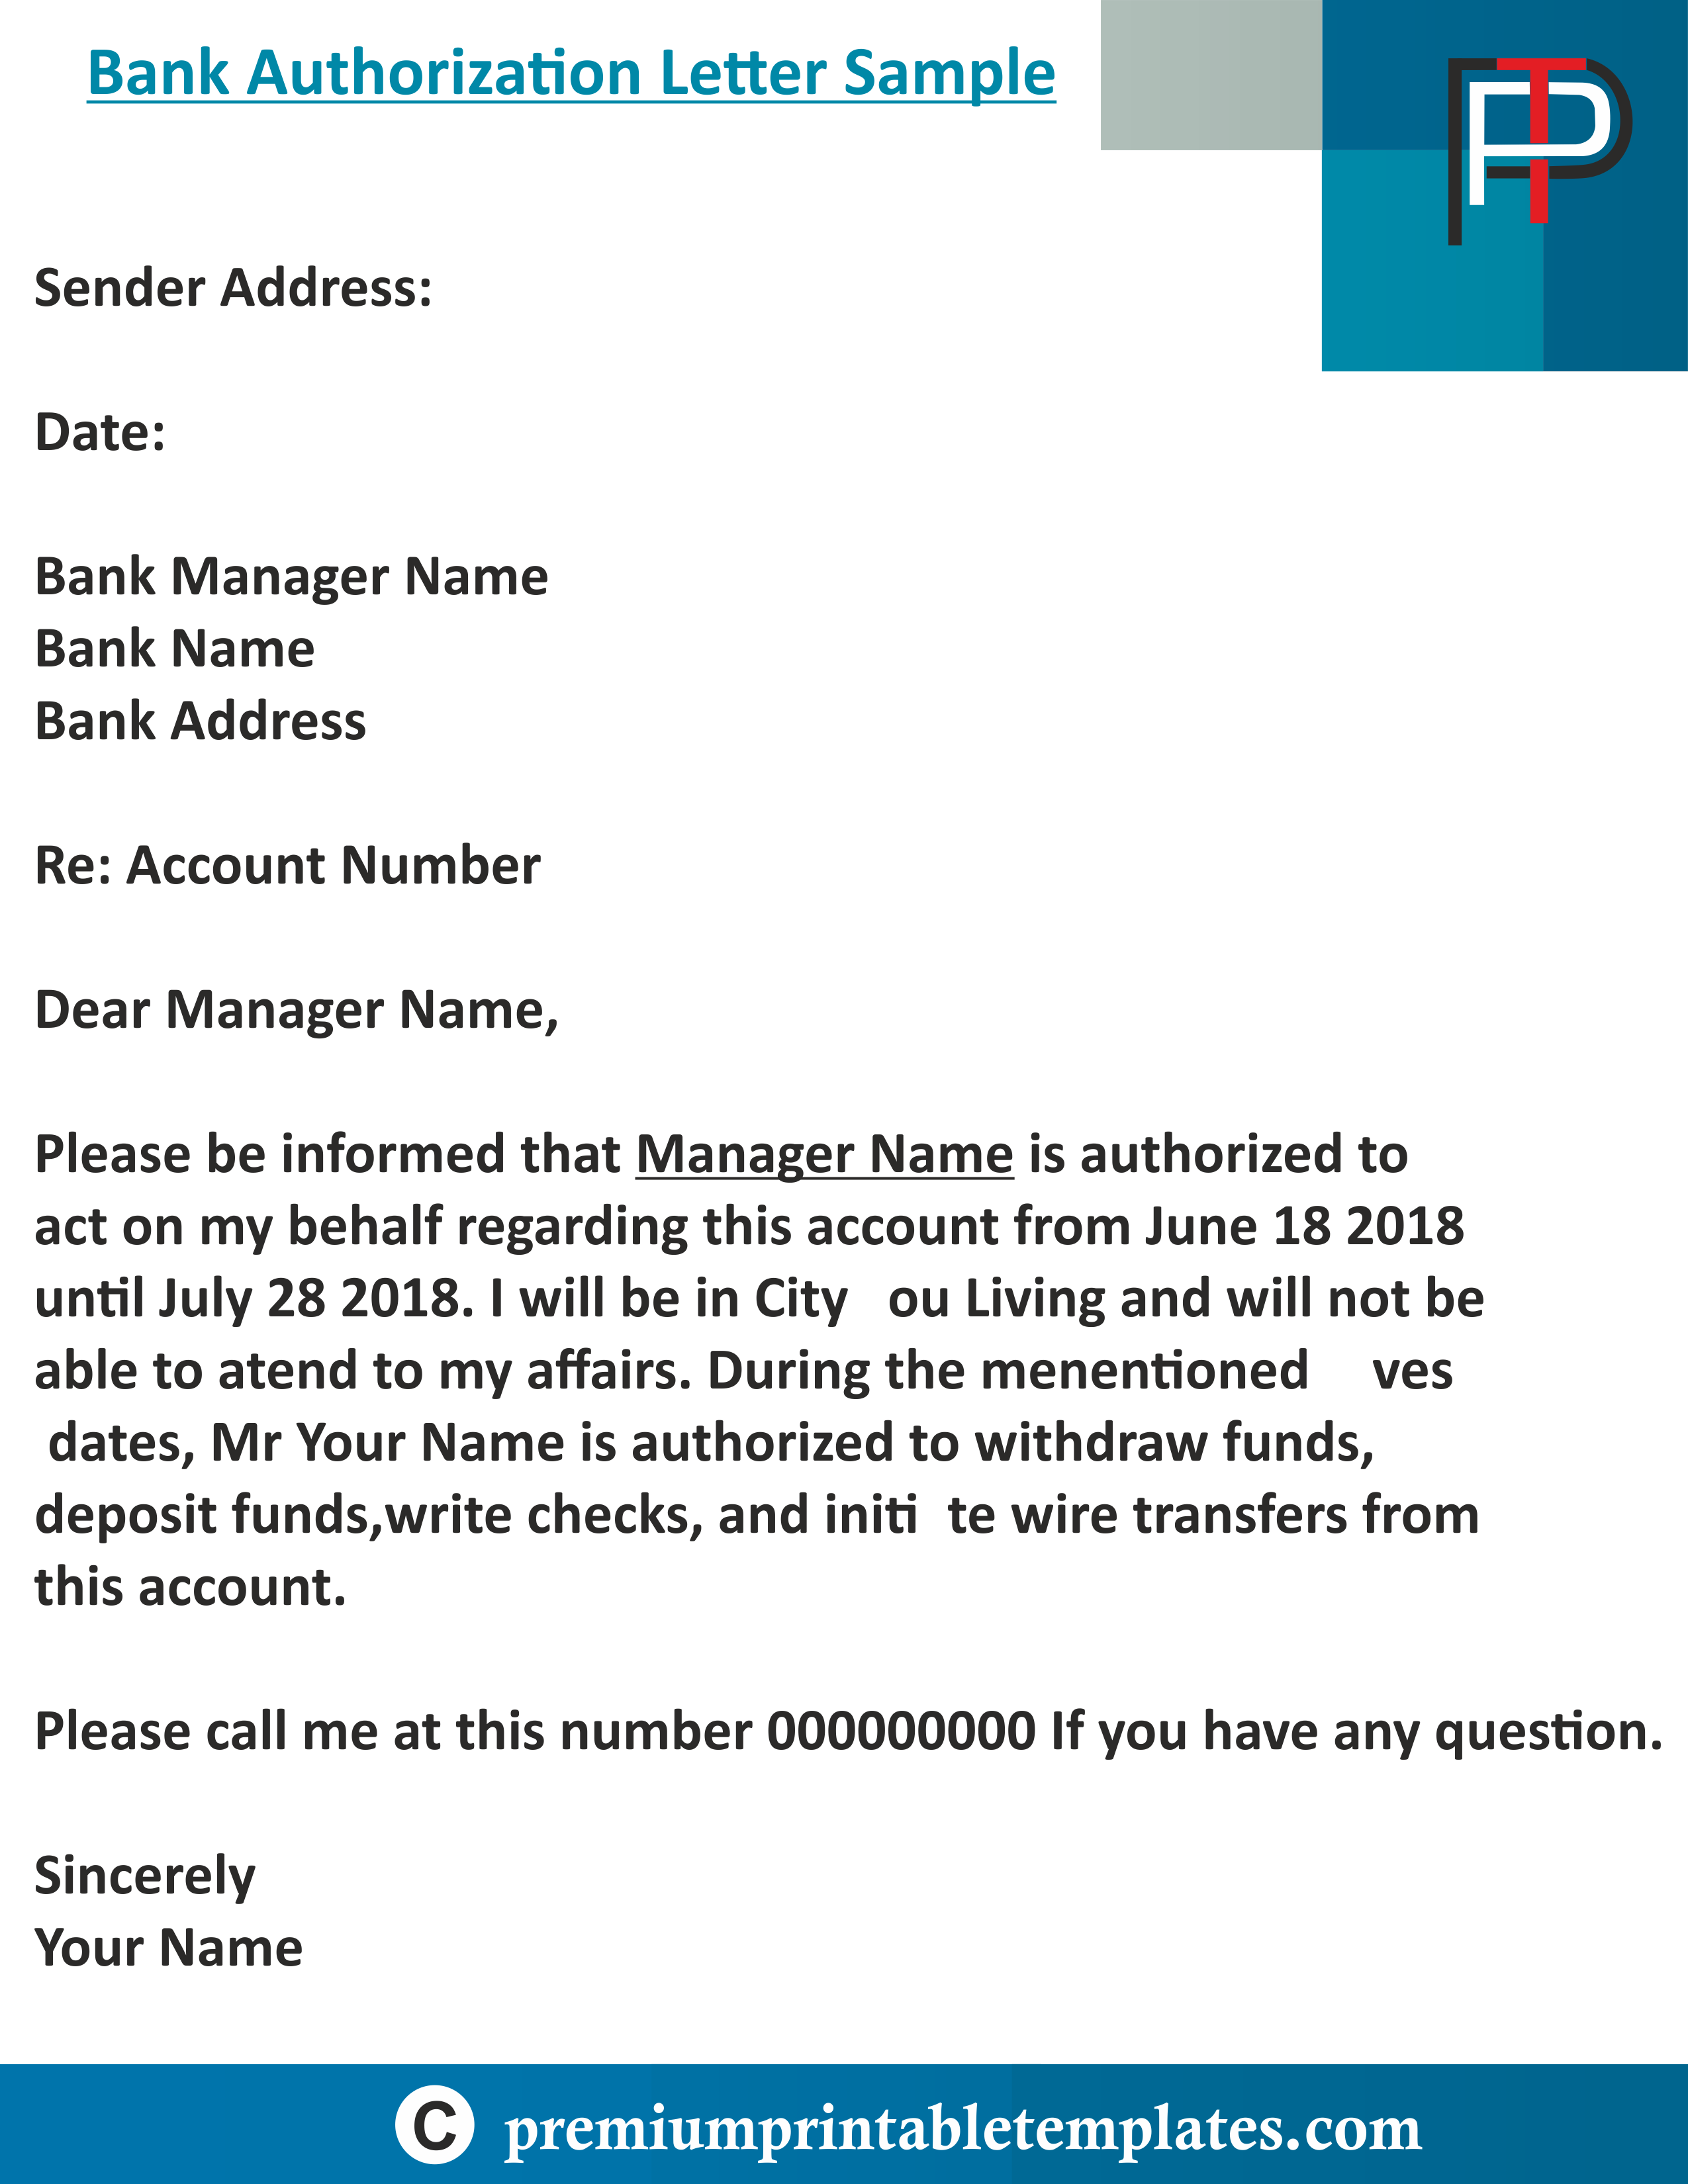 Bank Authorization Letter Template Premium Printable